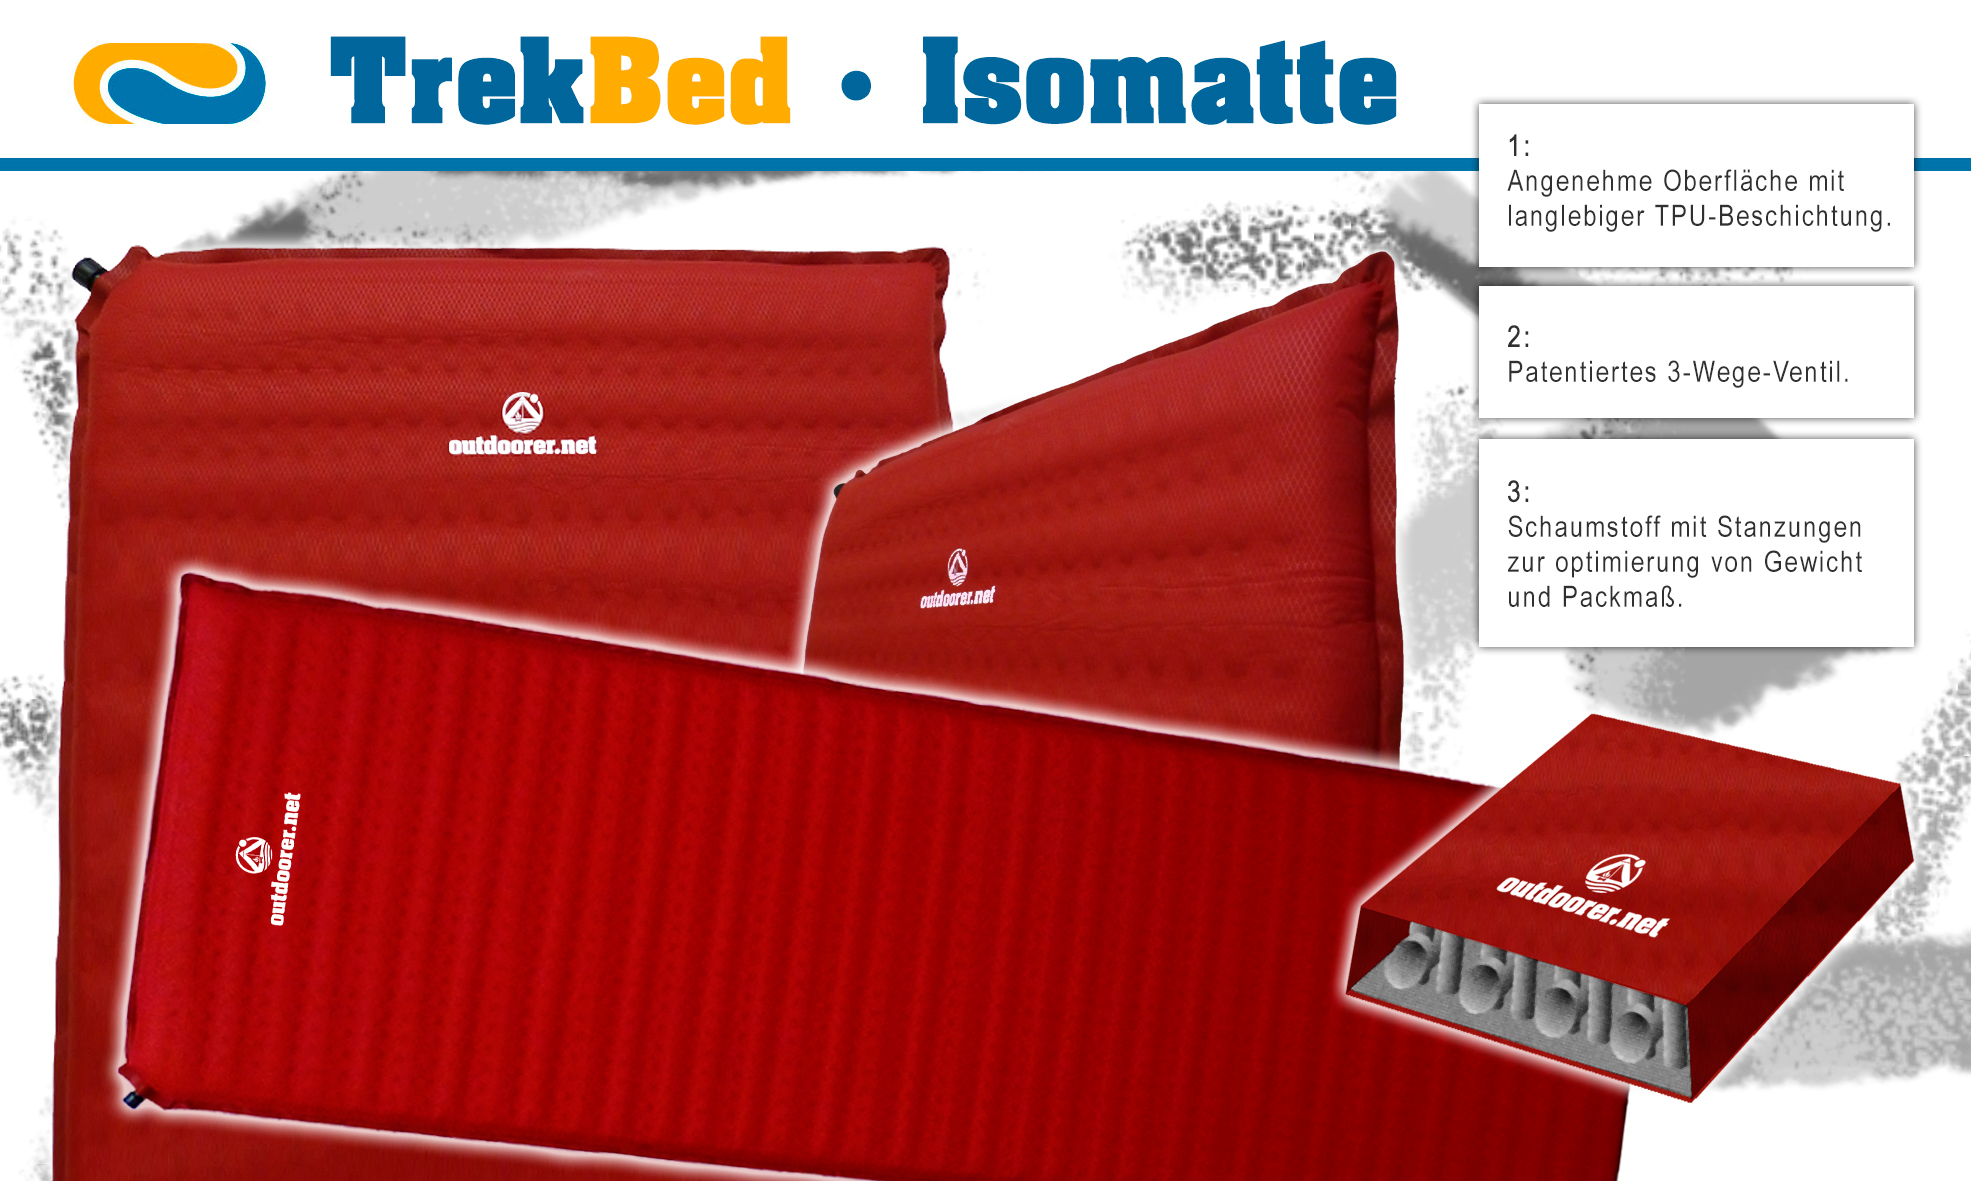 http://www.selbstaufblasbare-isomatte.com/wp-content/uploads/2013/04/isomatte_mit_innenleben.jpg